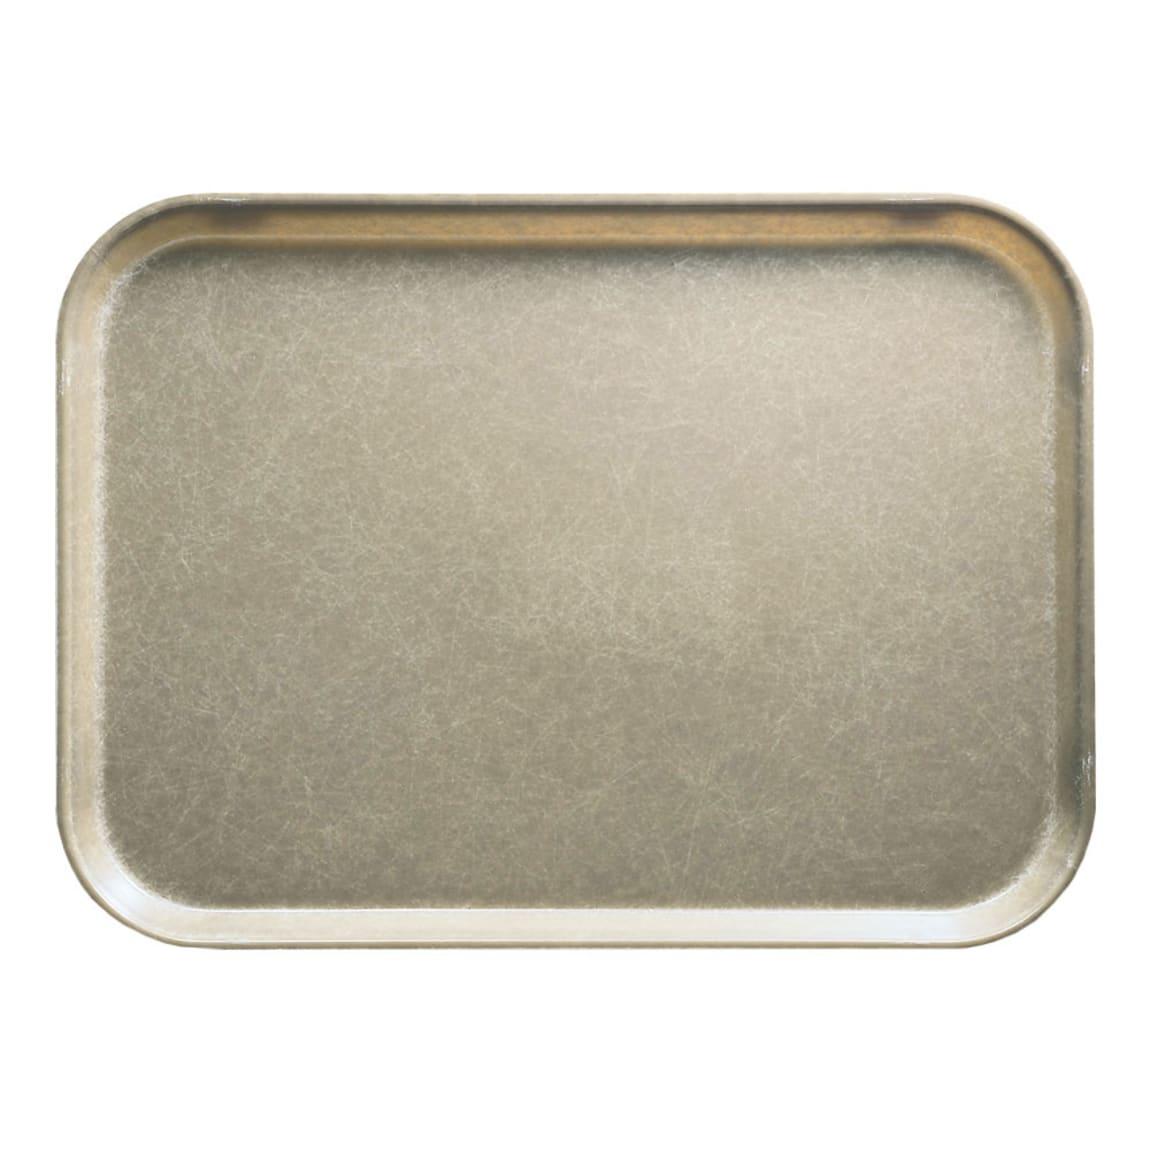 "Cambro 1014104 Fiberglass Camtray® Cafeteria Tray - 13.75""L x 10.6""W, Desert Tan"